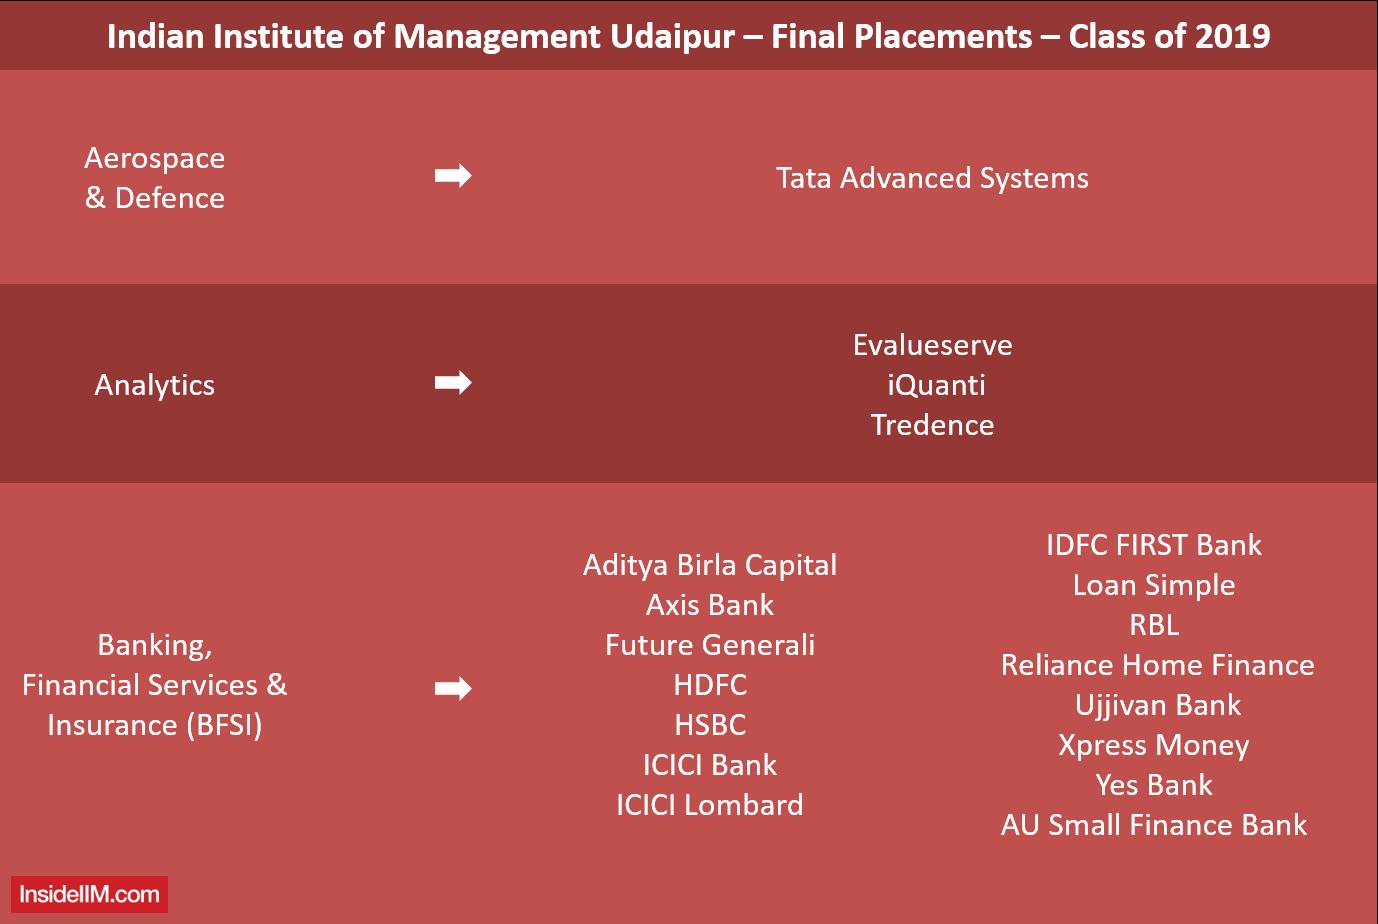 IIM Udaipur Final Placements 2019 - Companies: BFSI, Analytics, Aerospace & Defence